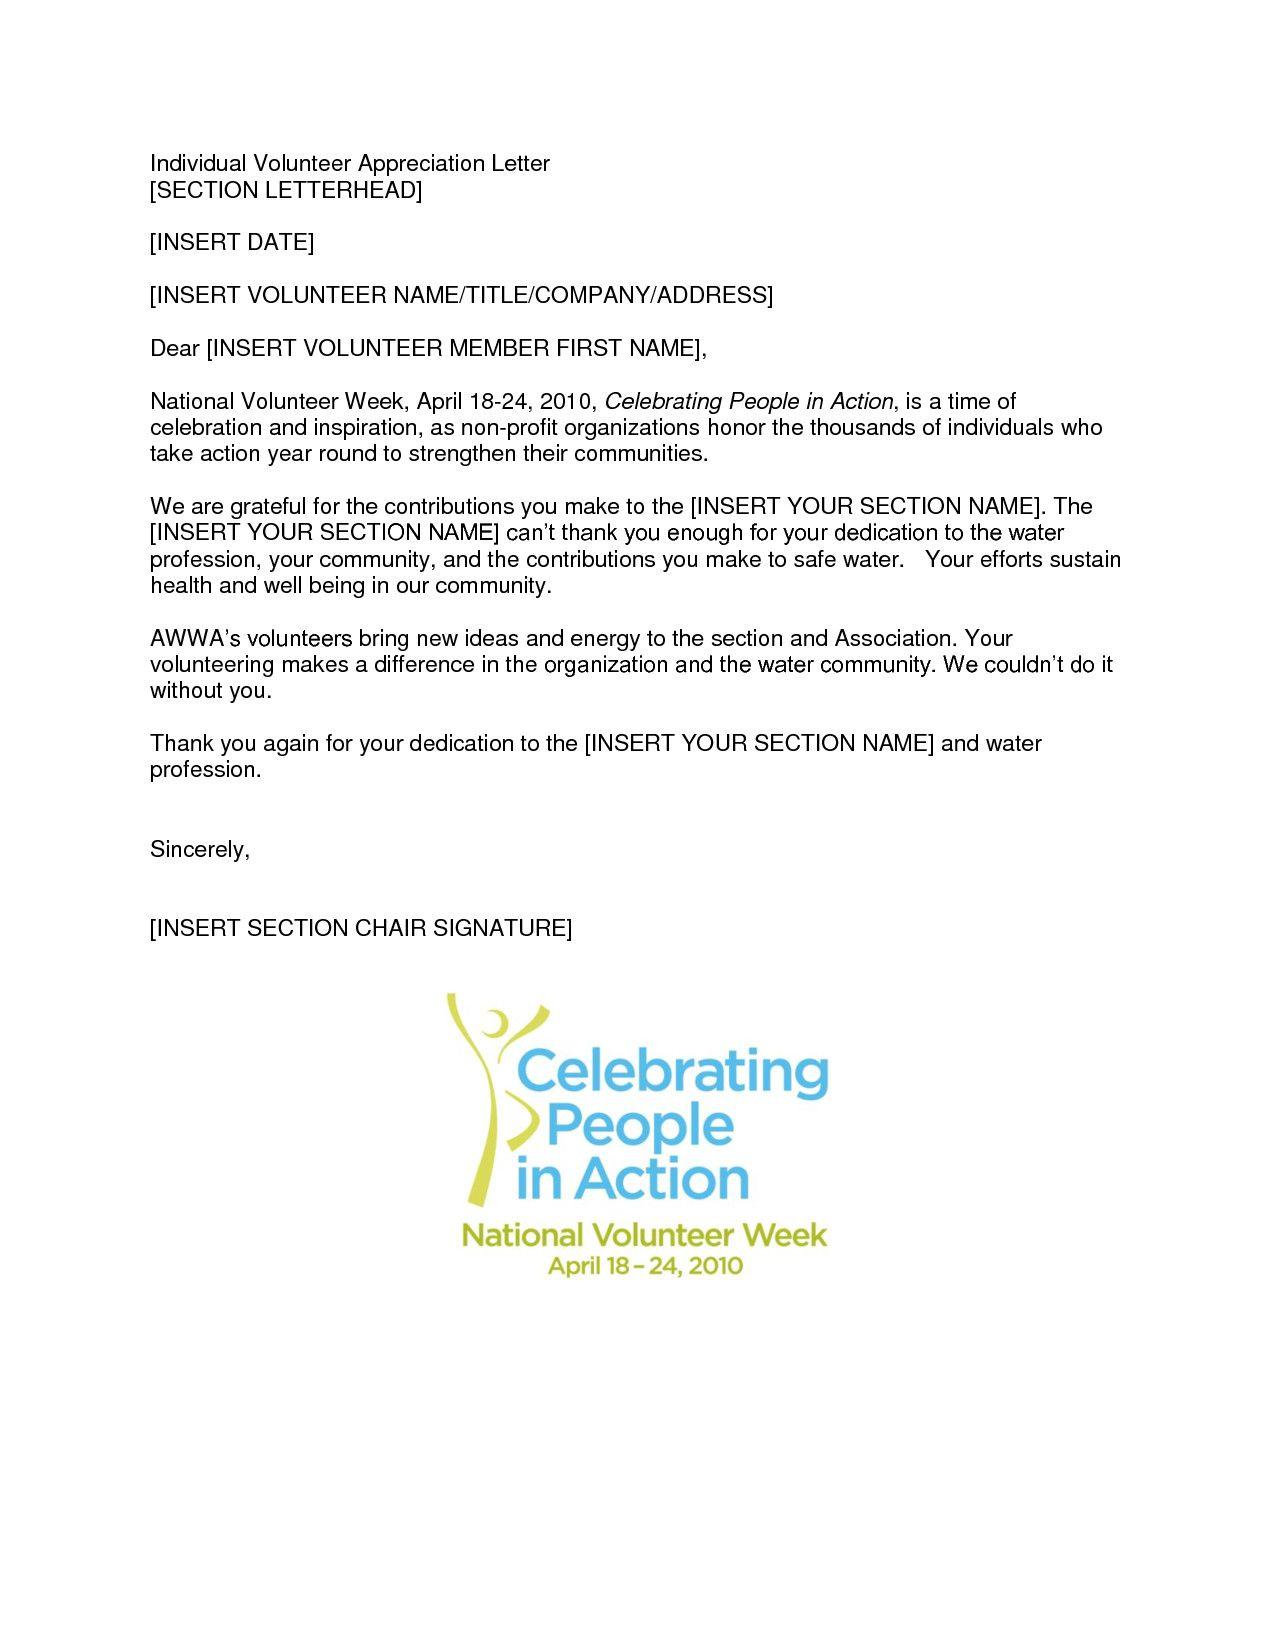 Volunteer Letter Of Appreciation Template Beautiful Volunteer